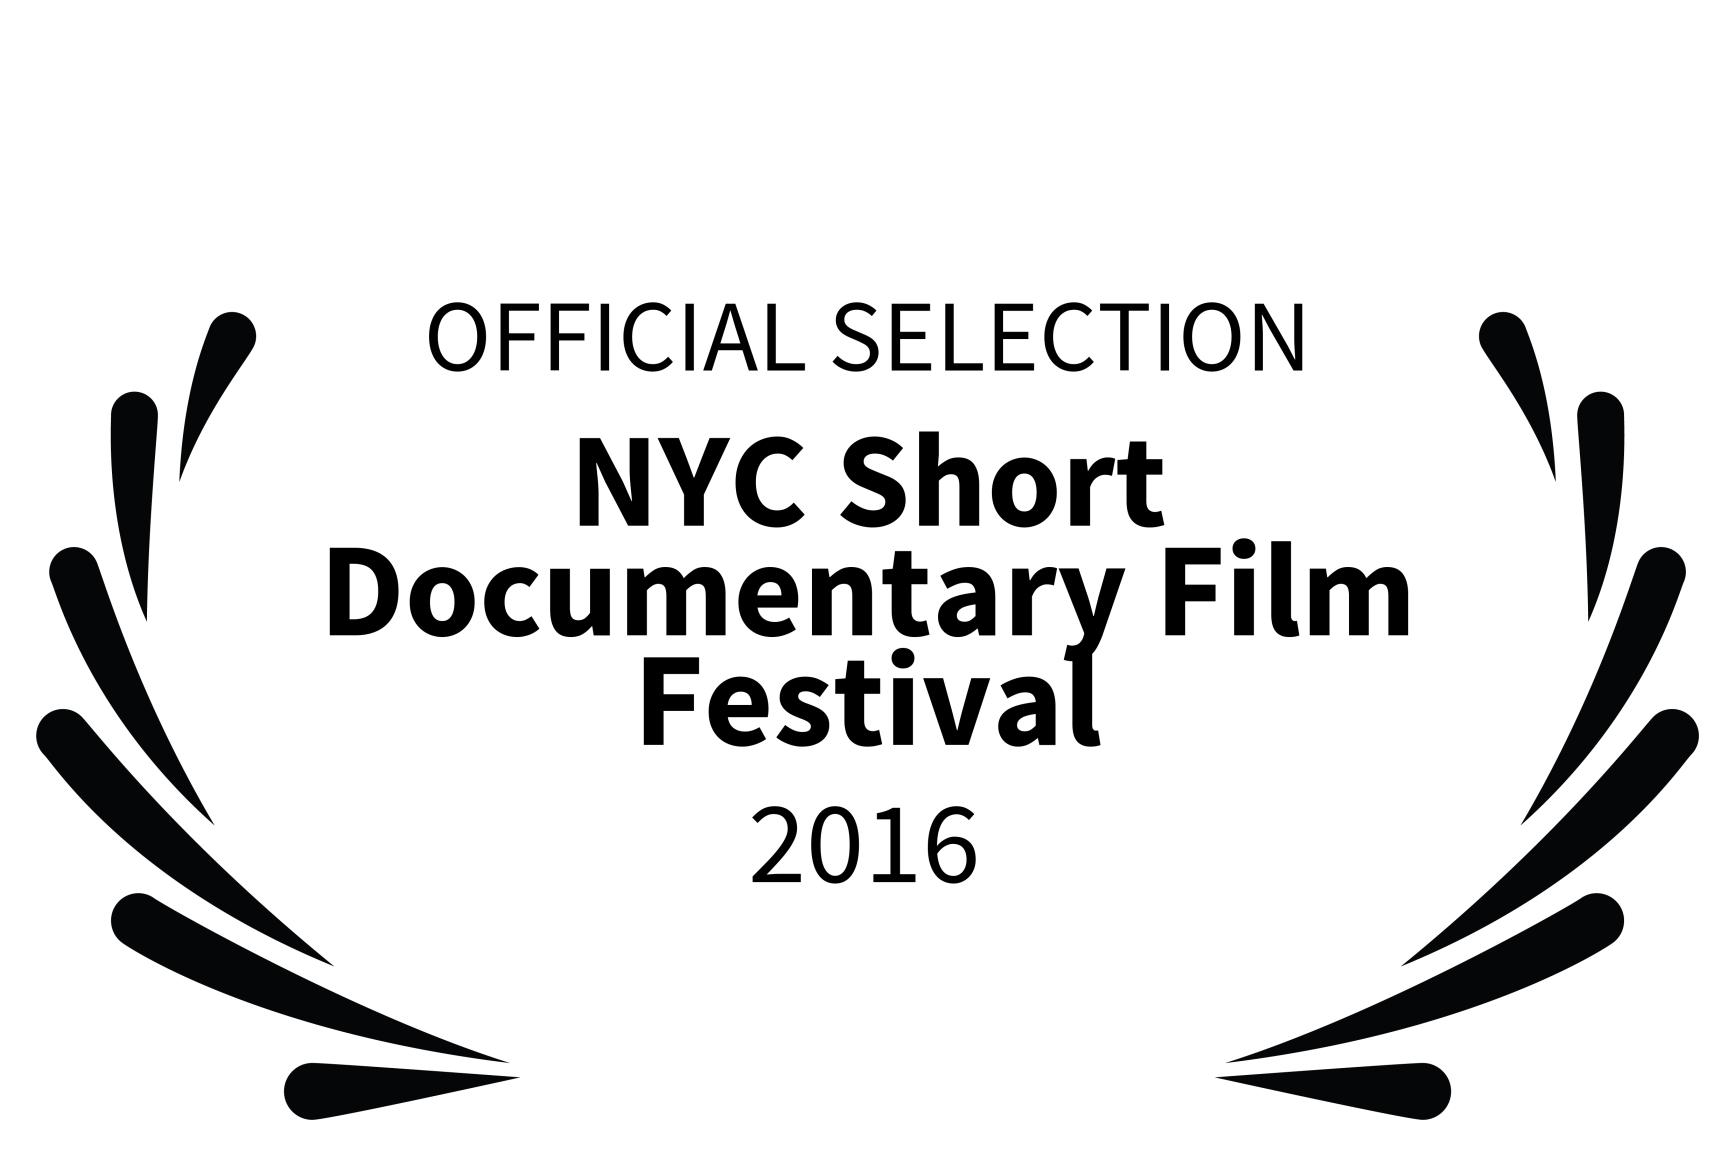 NYC Short Documentary Film Festival 2016.jpg